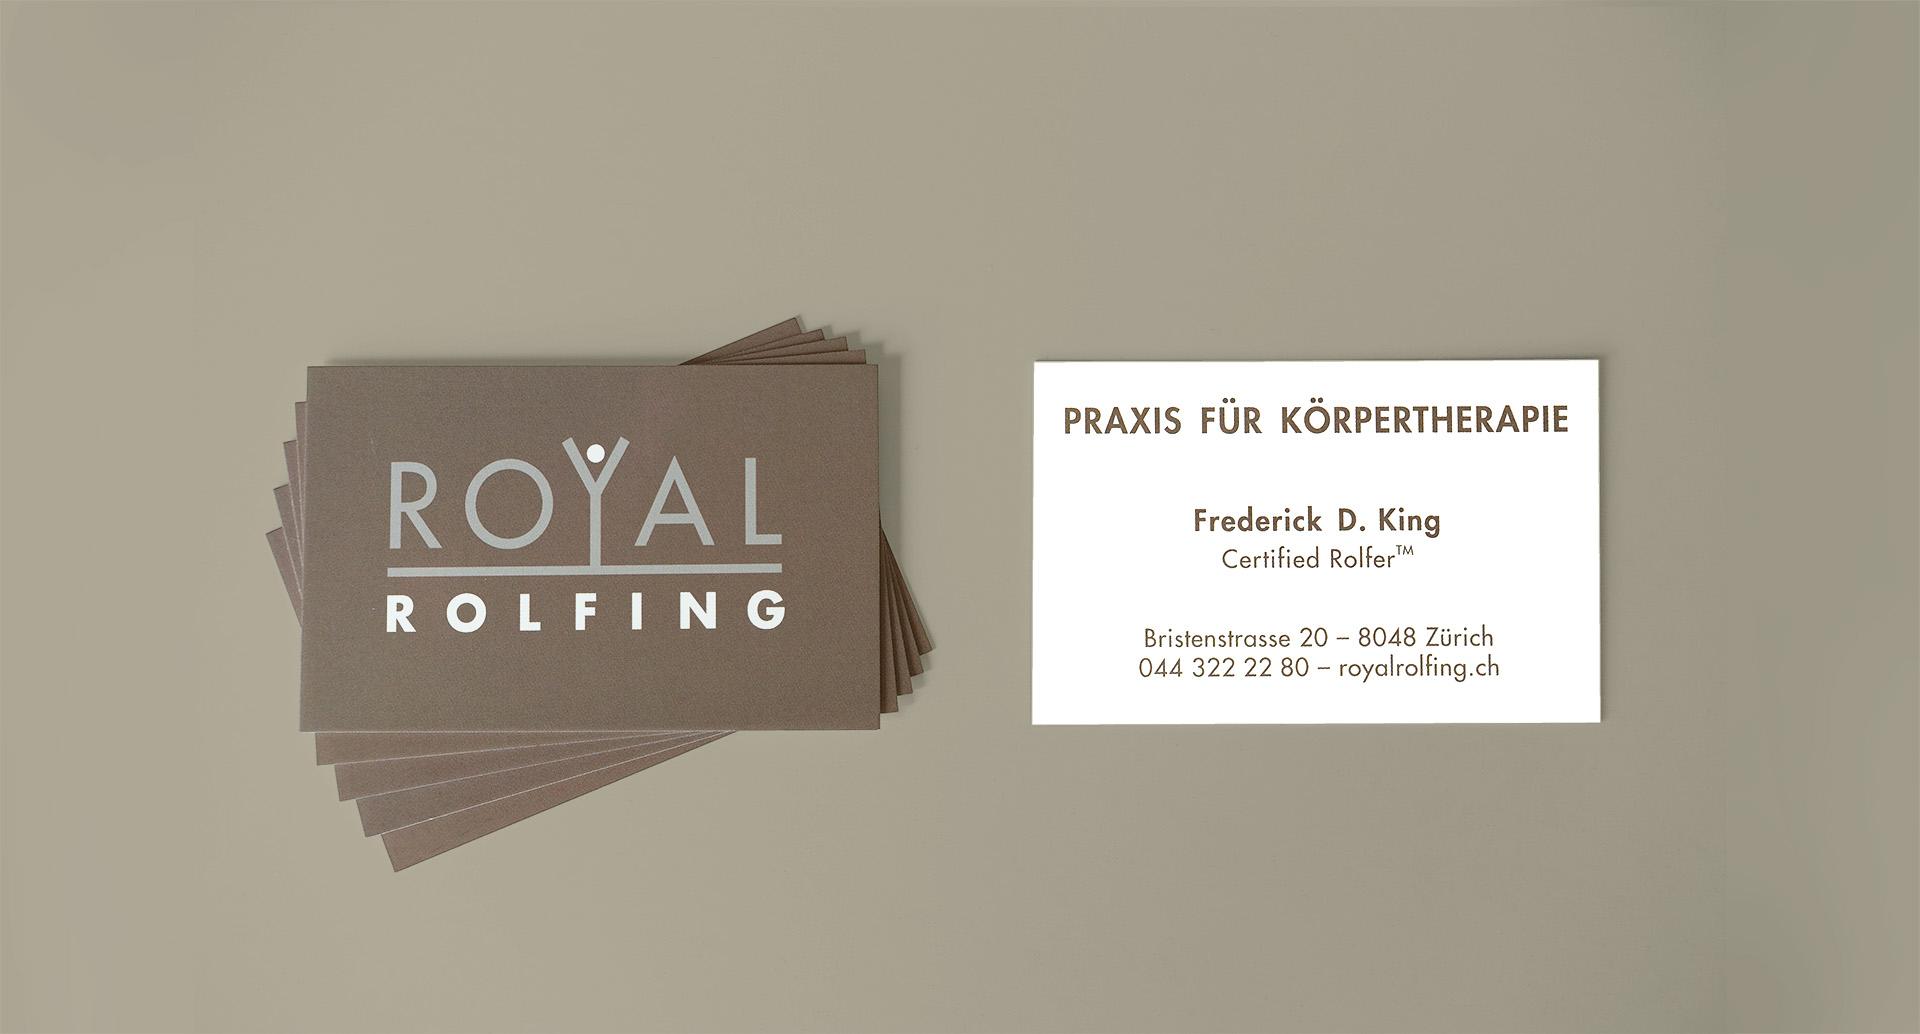 RoyalRolfing_Visitenkarte_Hauptbild